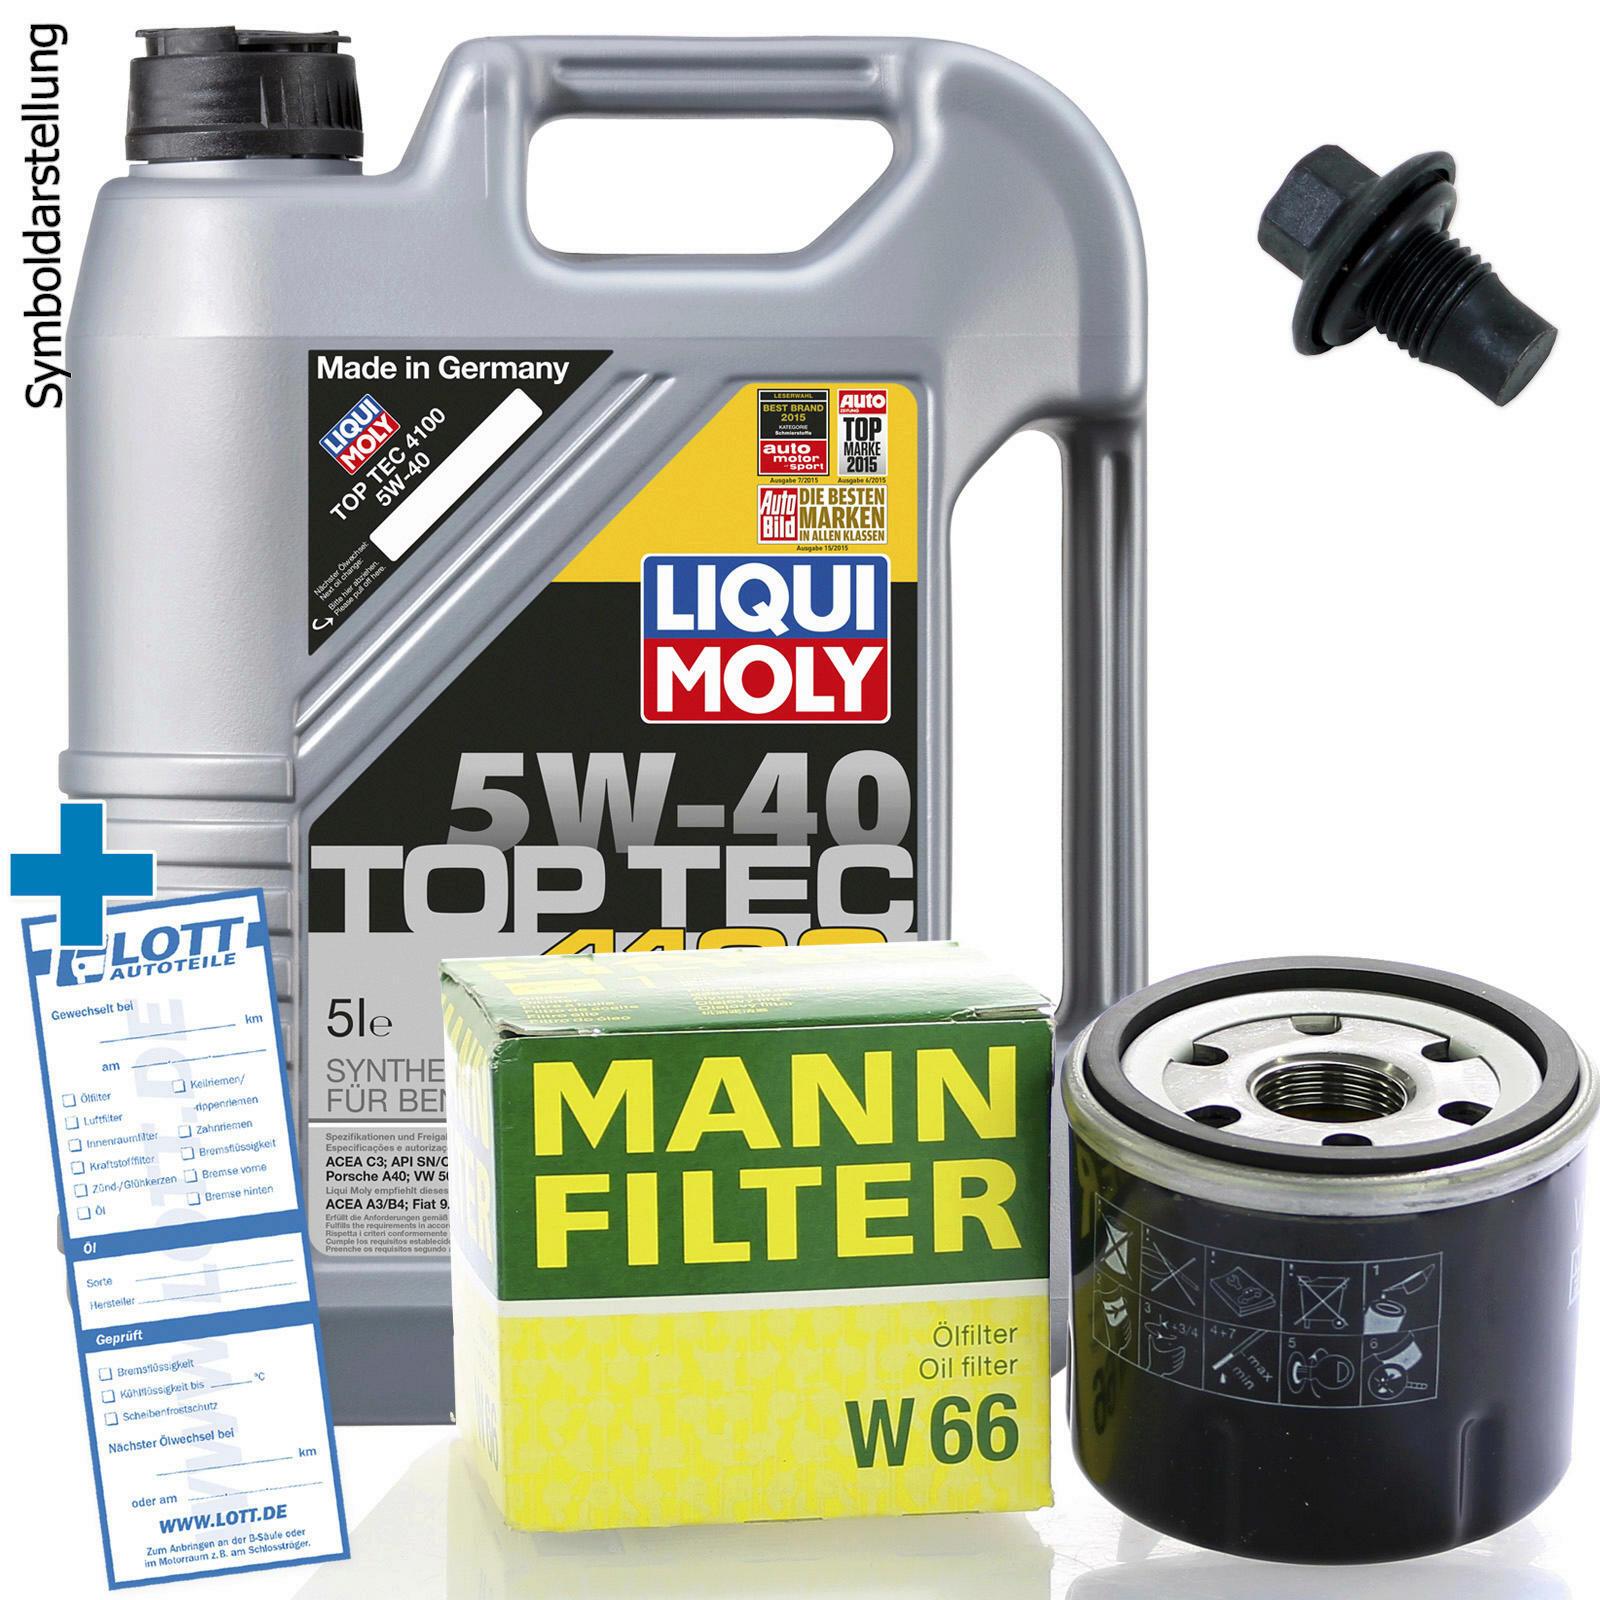 Ölwechsel Set 5L 5W40 Öl Motoröl LIQUI MOLY + MANN Ölfilter + Ablassschraube